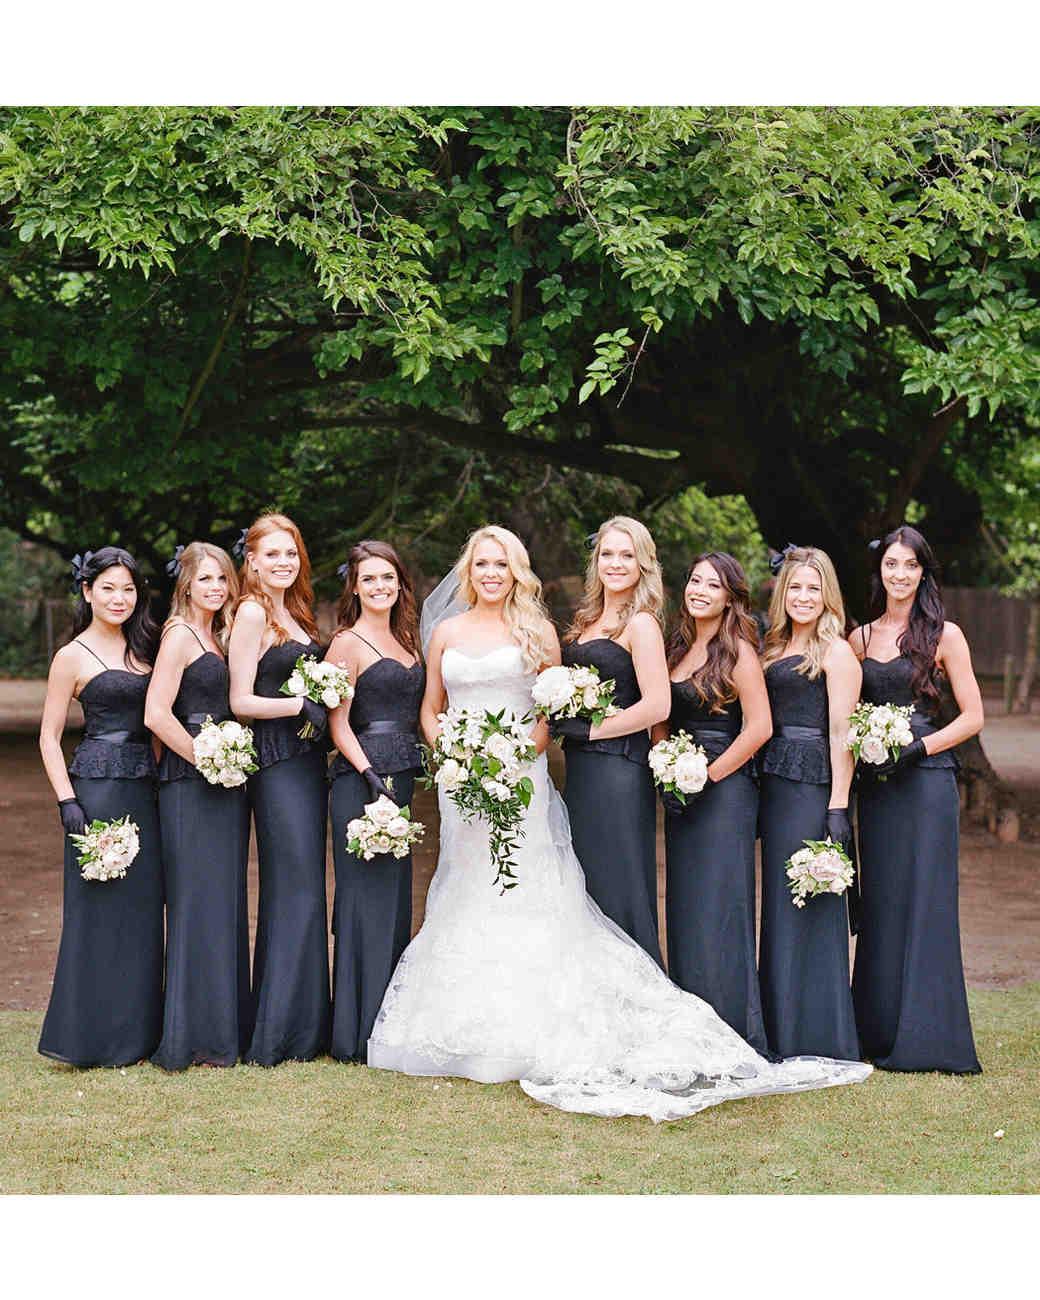 shannon jon wedding bridesmaids